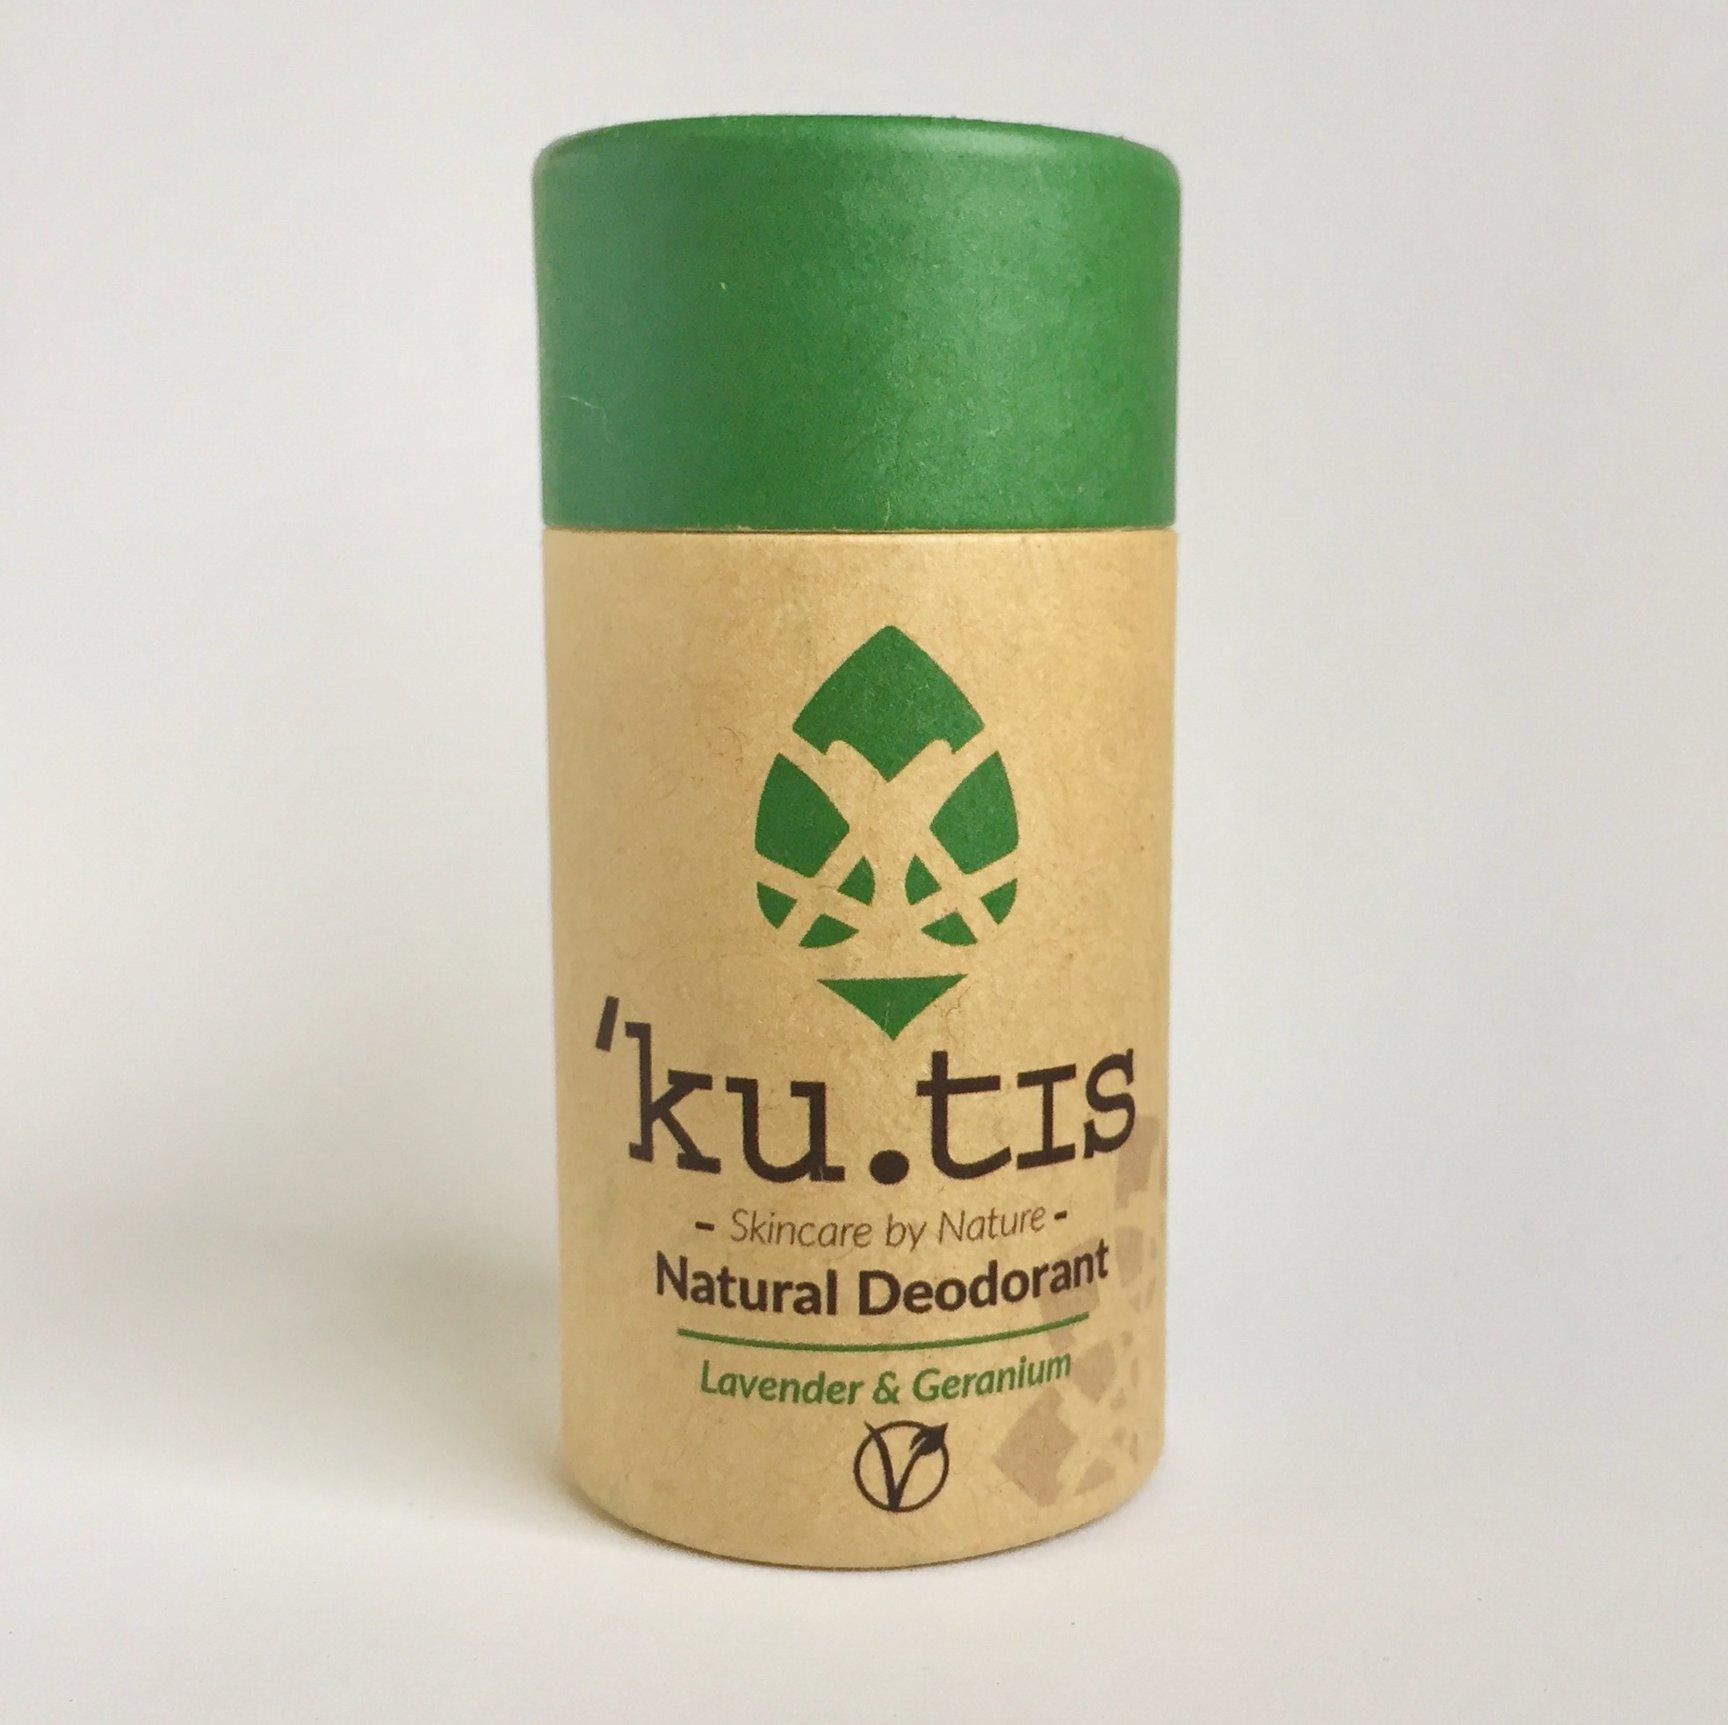 Push-up Deodorant by Ku.tis (Organic)